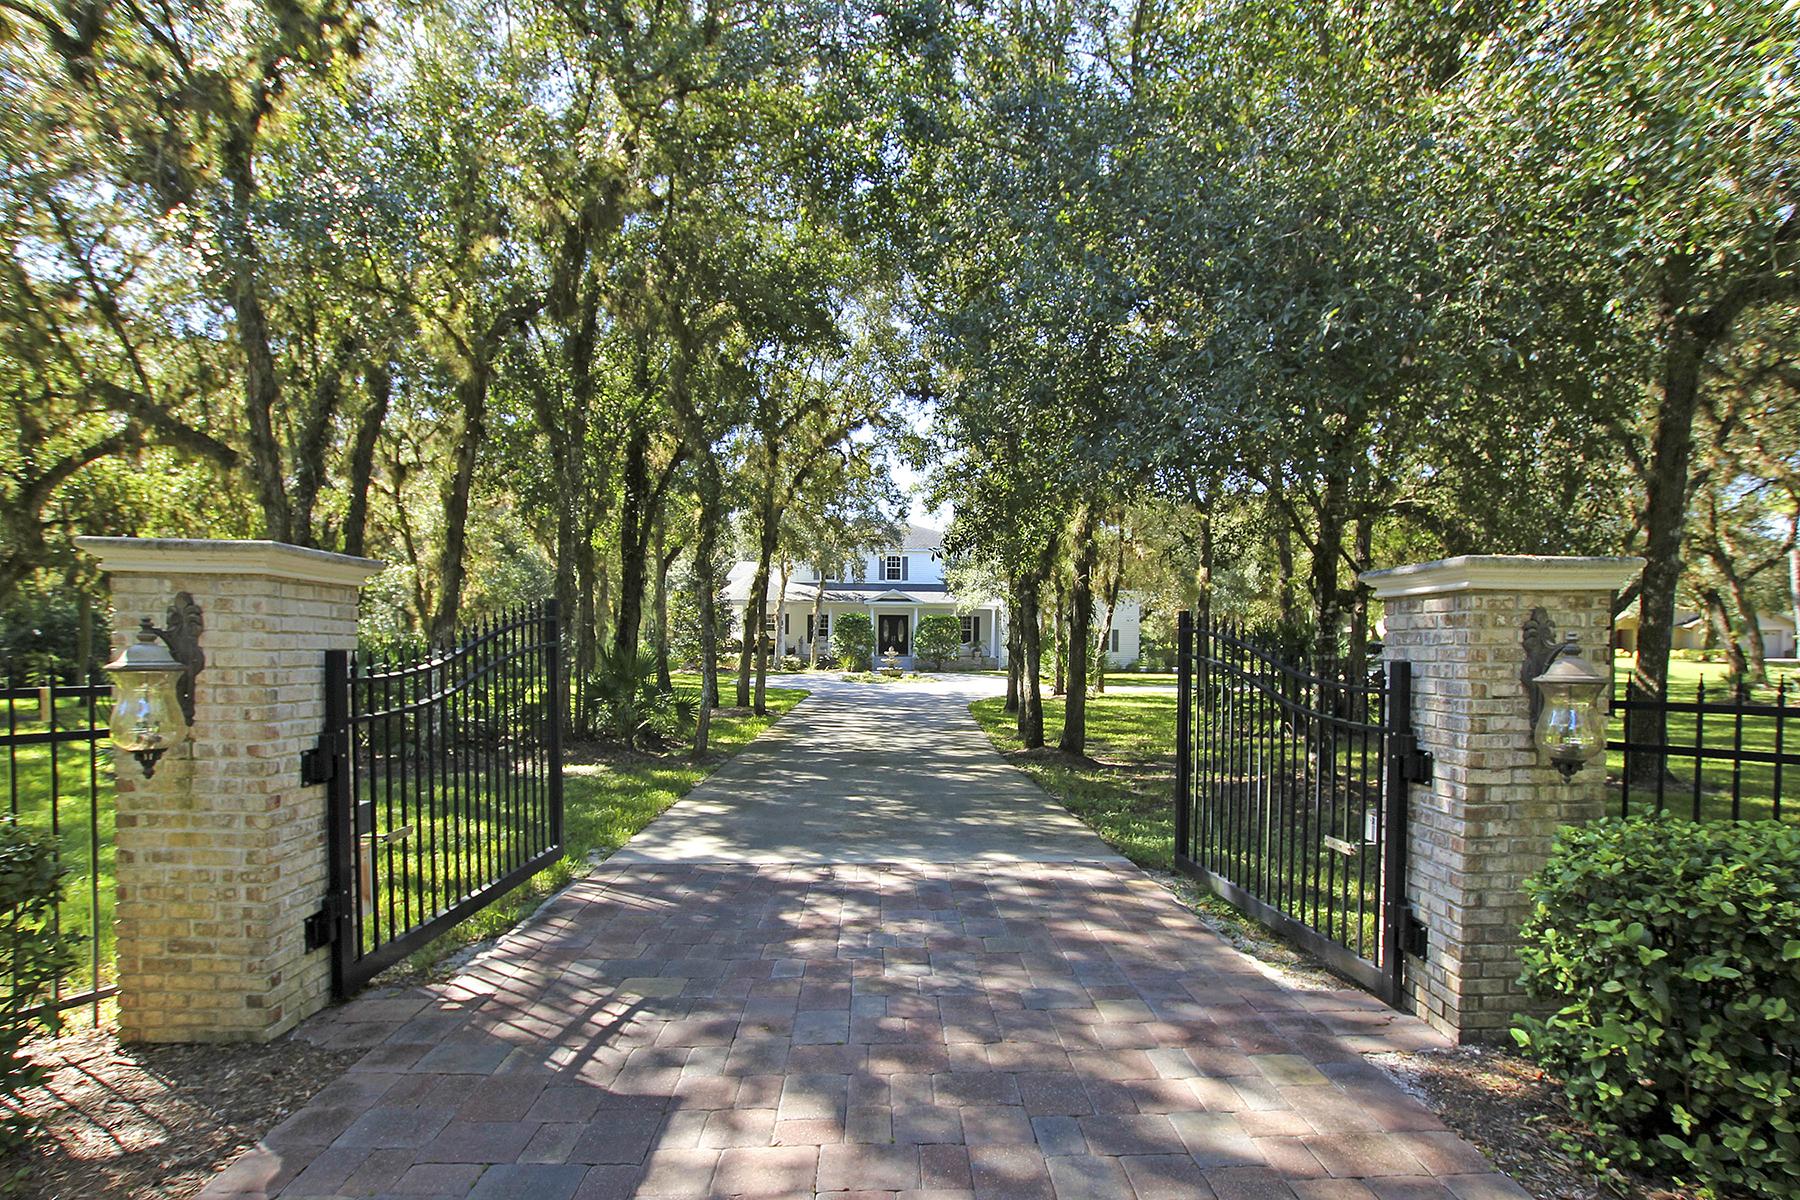 Single Family Home for Sale at ALVA 17280 Frank Rd Alva, Florida 33920 United States